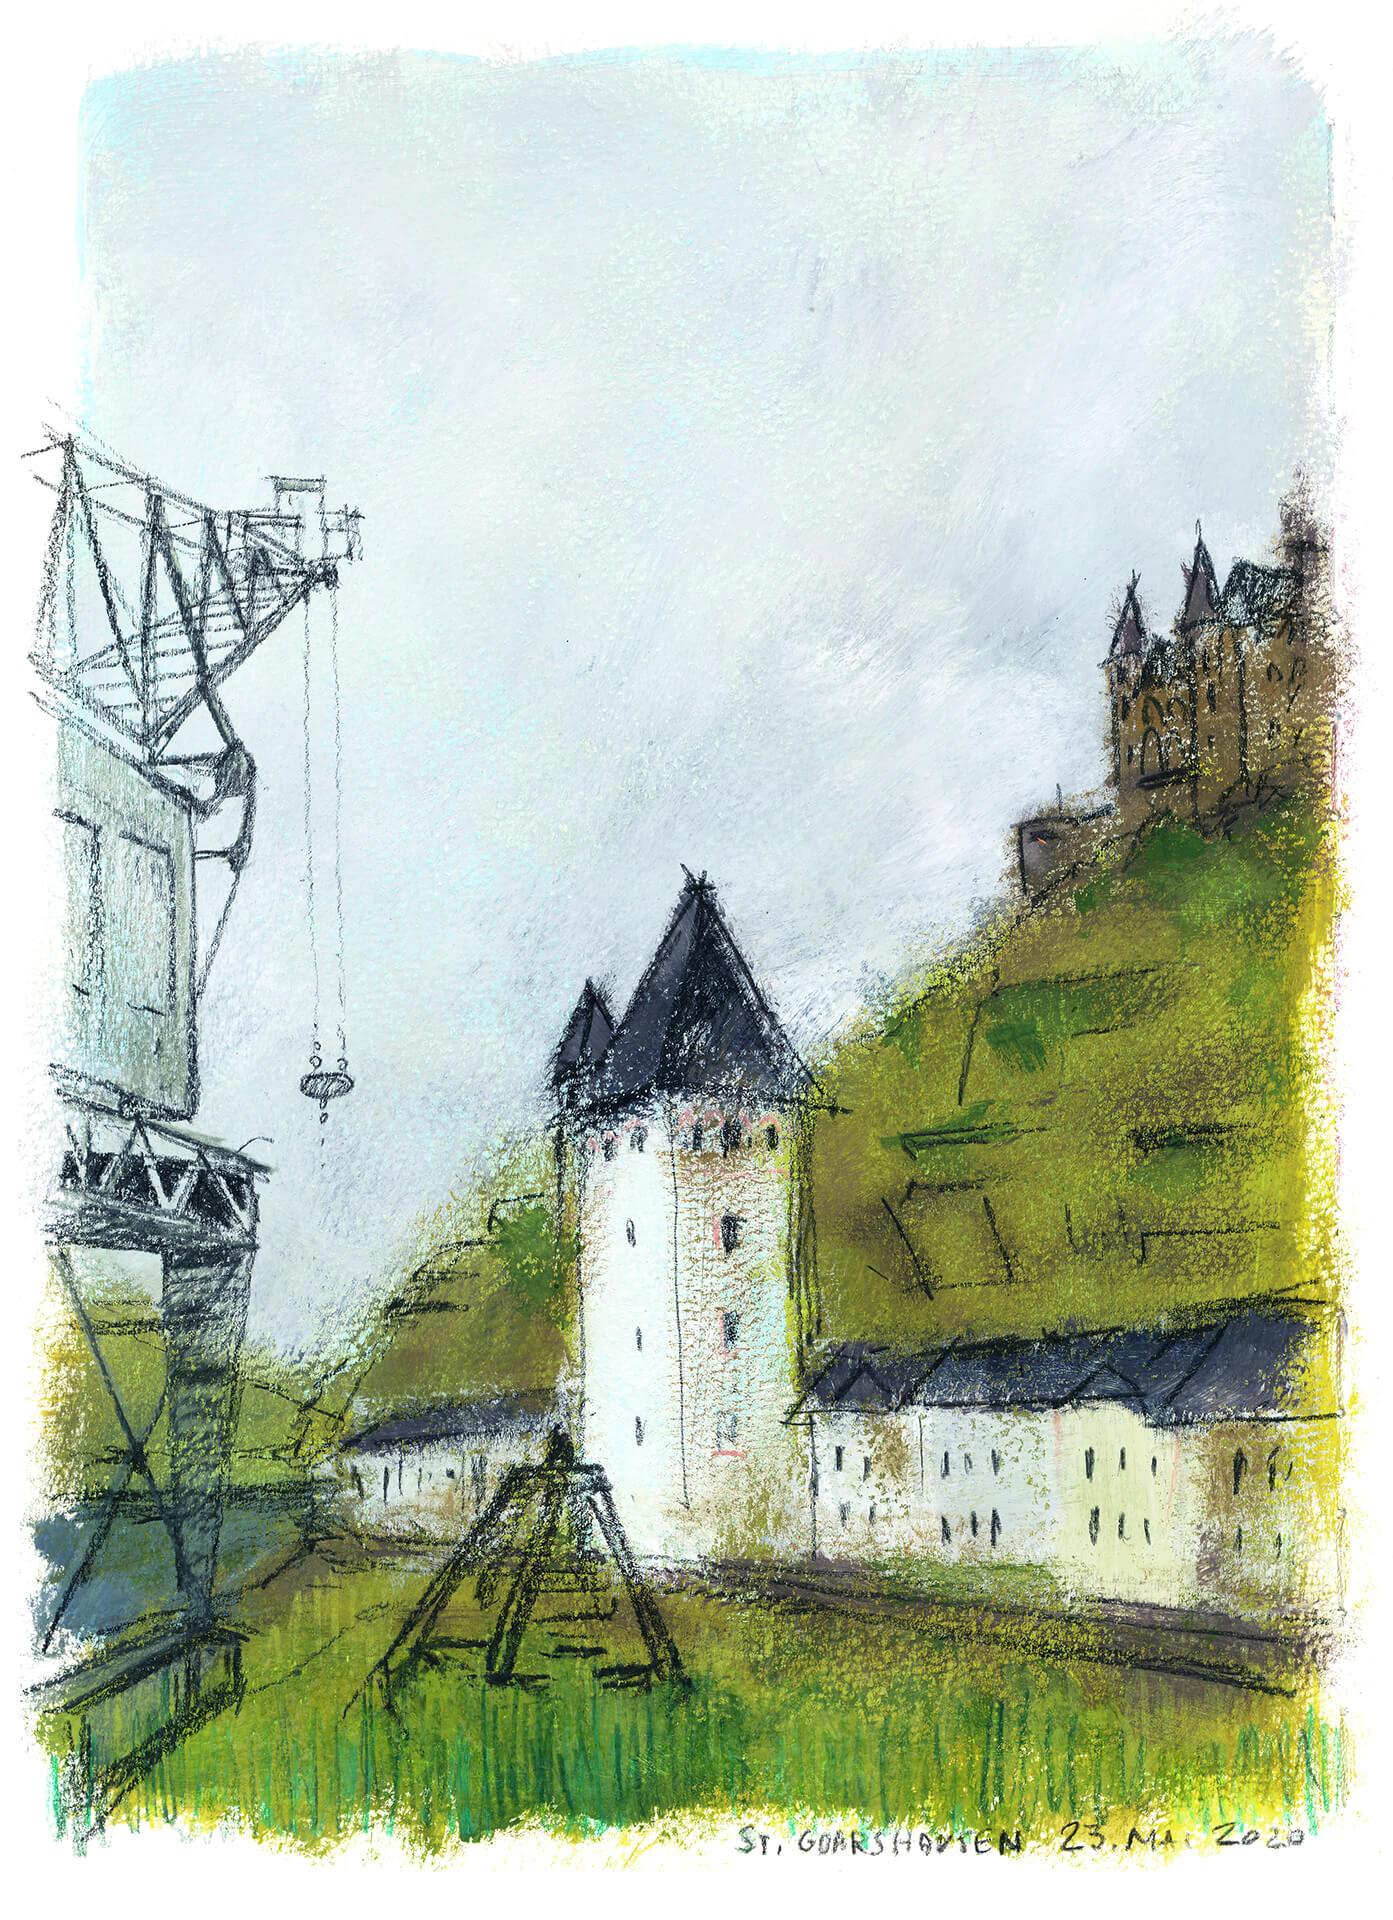 St. Goarshausen – Victor Hugo Urban Sketch Voyage